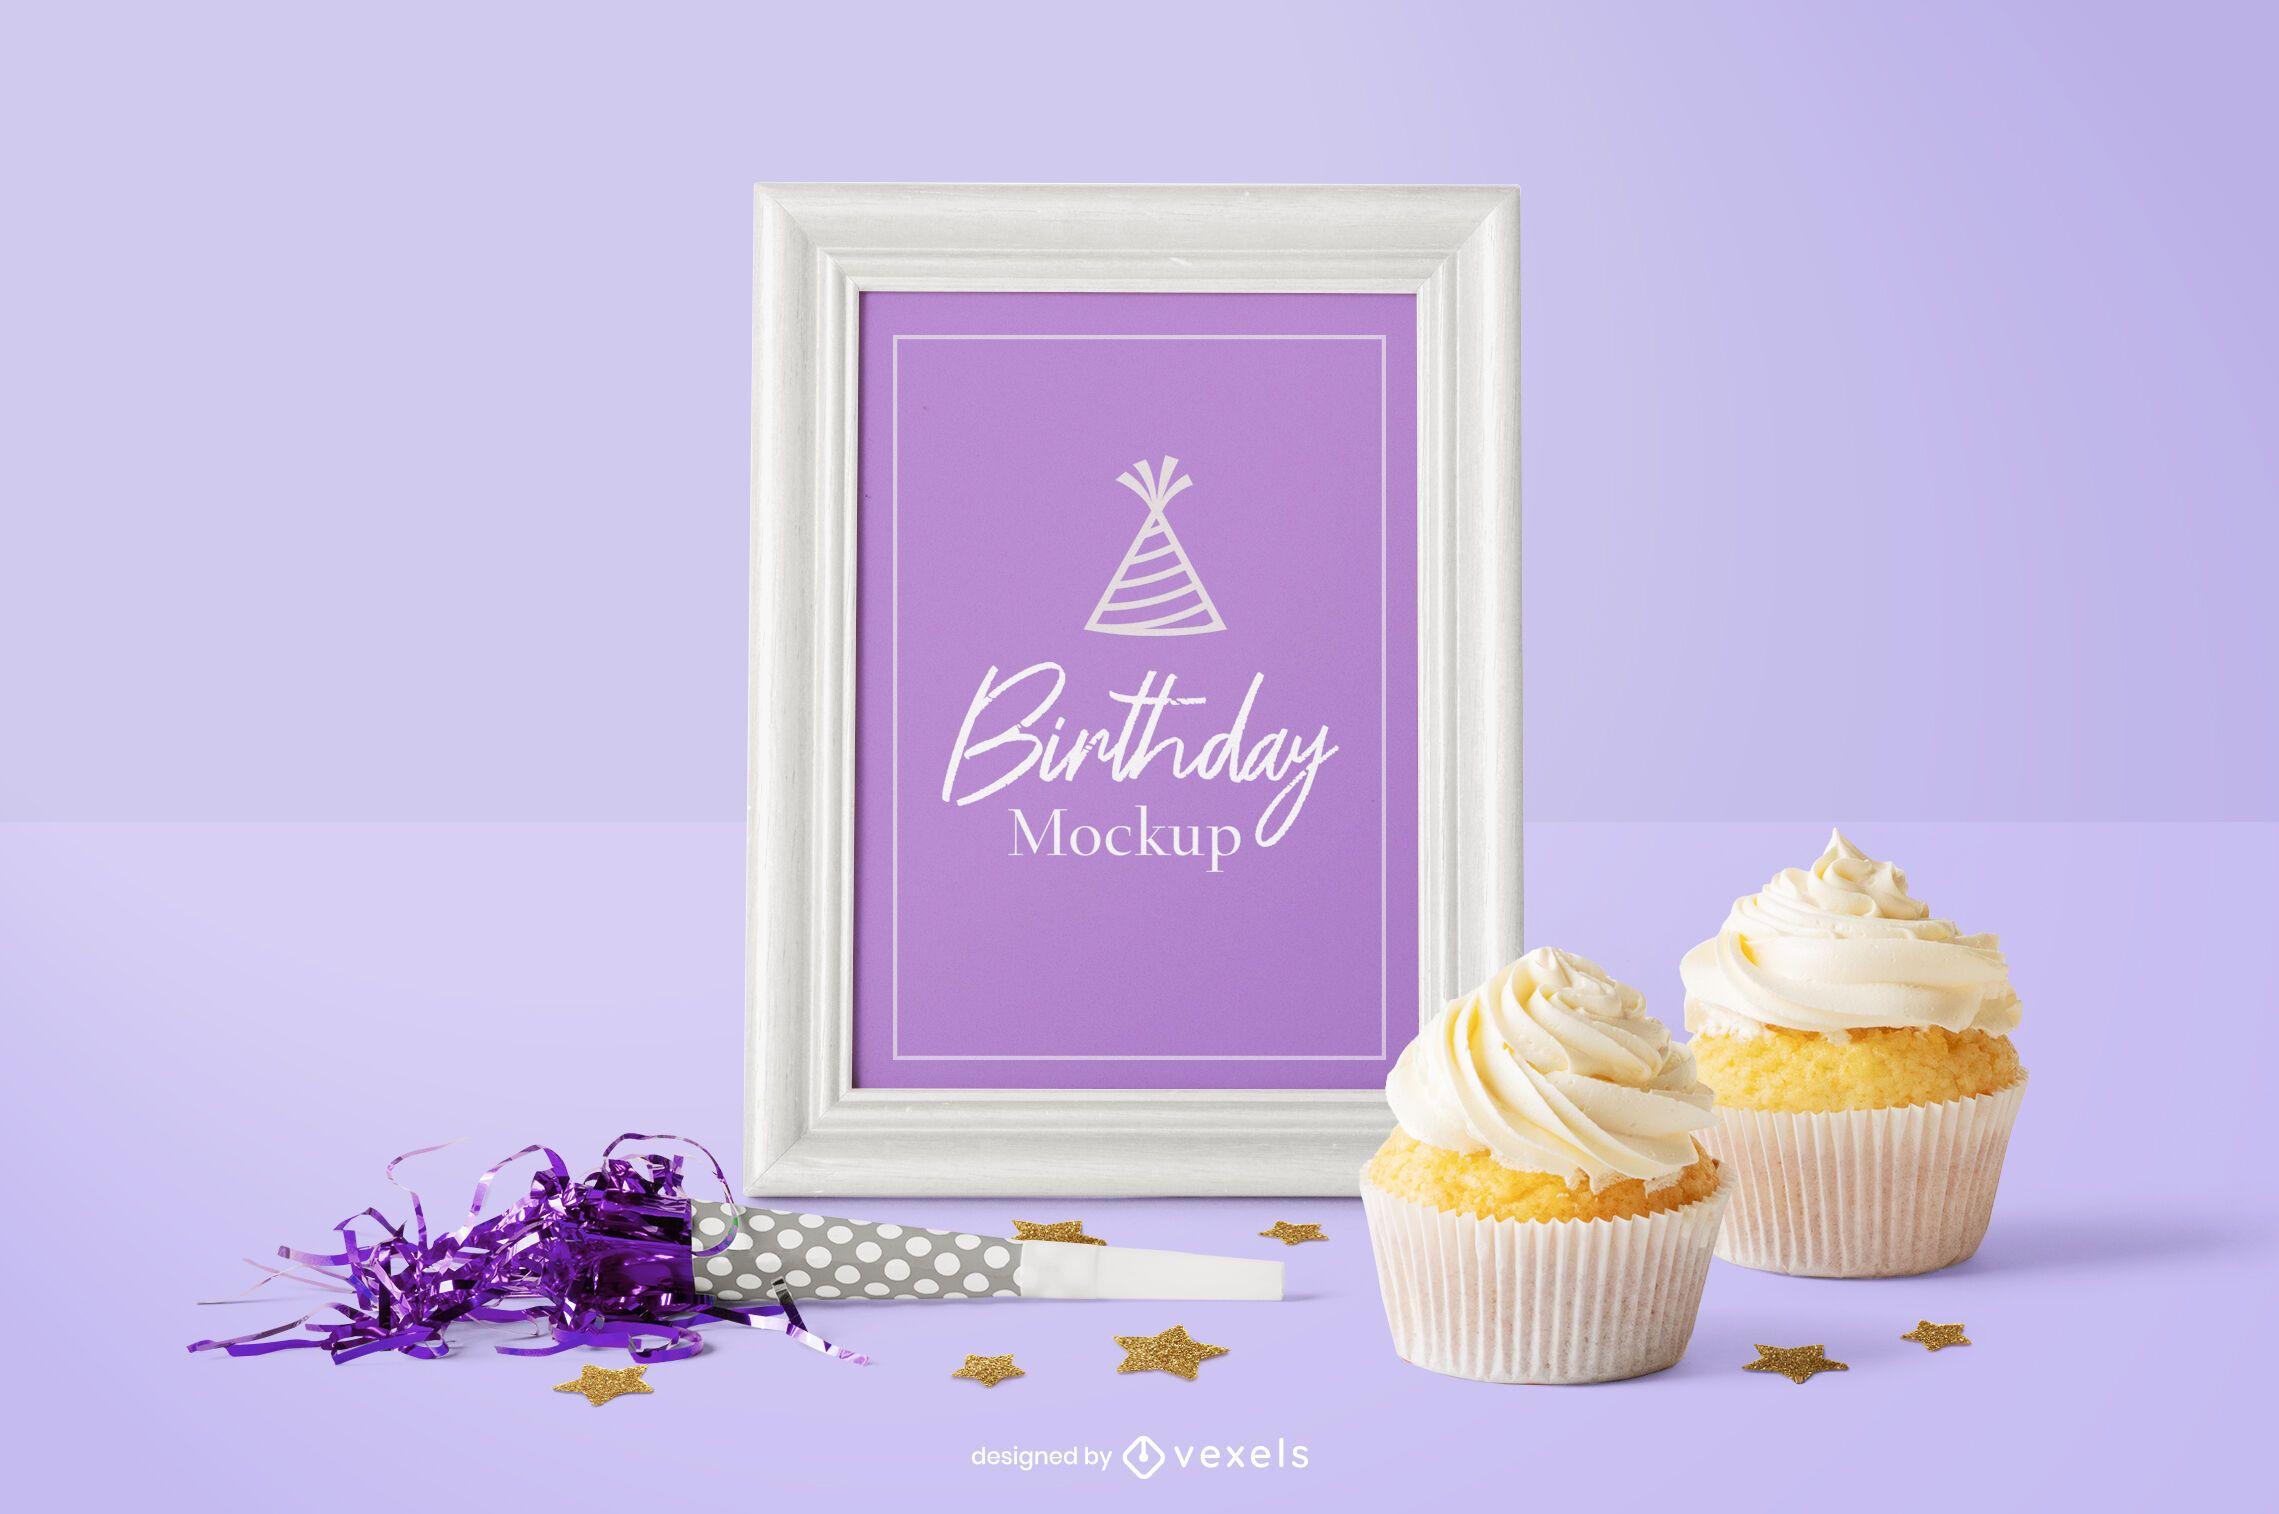 Birthday frame psd mockup composition